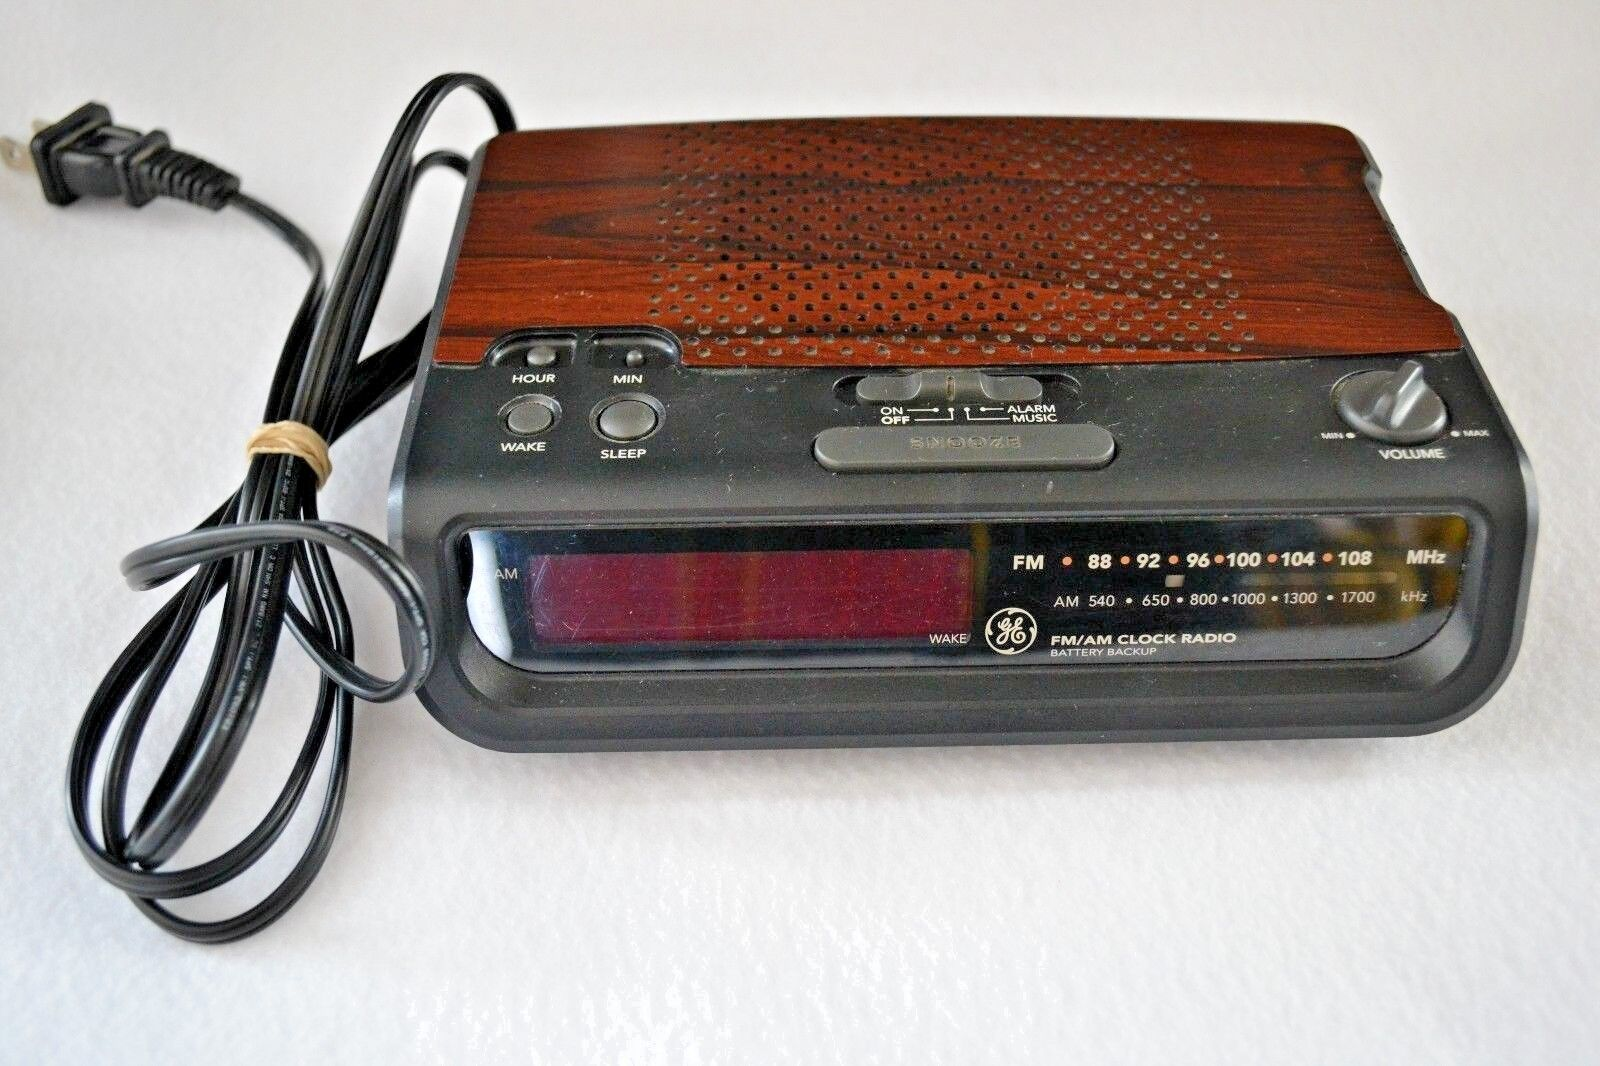 VINTAGE ALARM CLOCK GE General Electric 7-4613C Red Led AM-FM Alarm Clock Radio